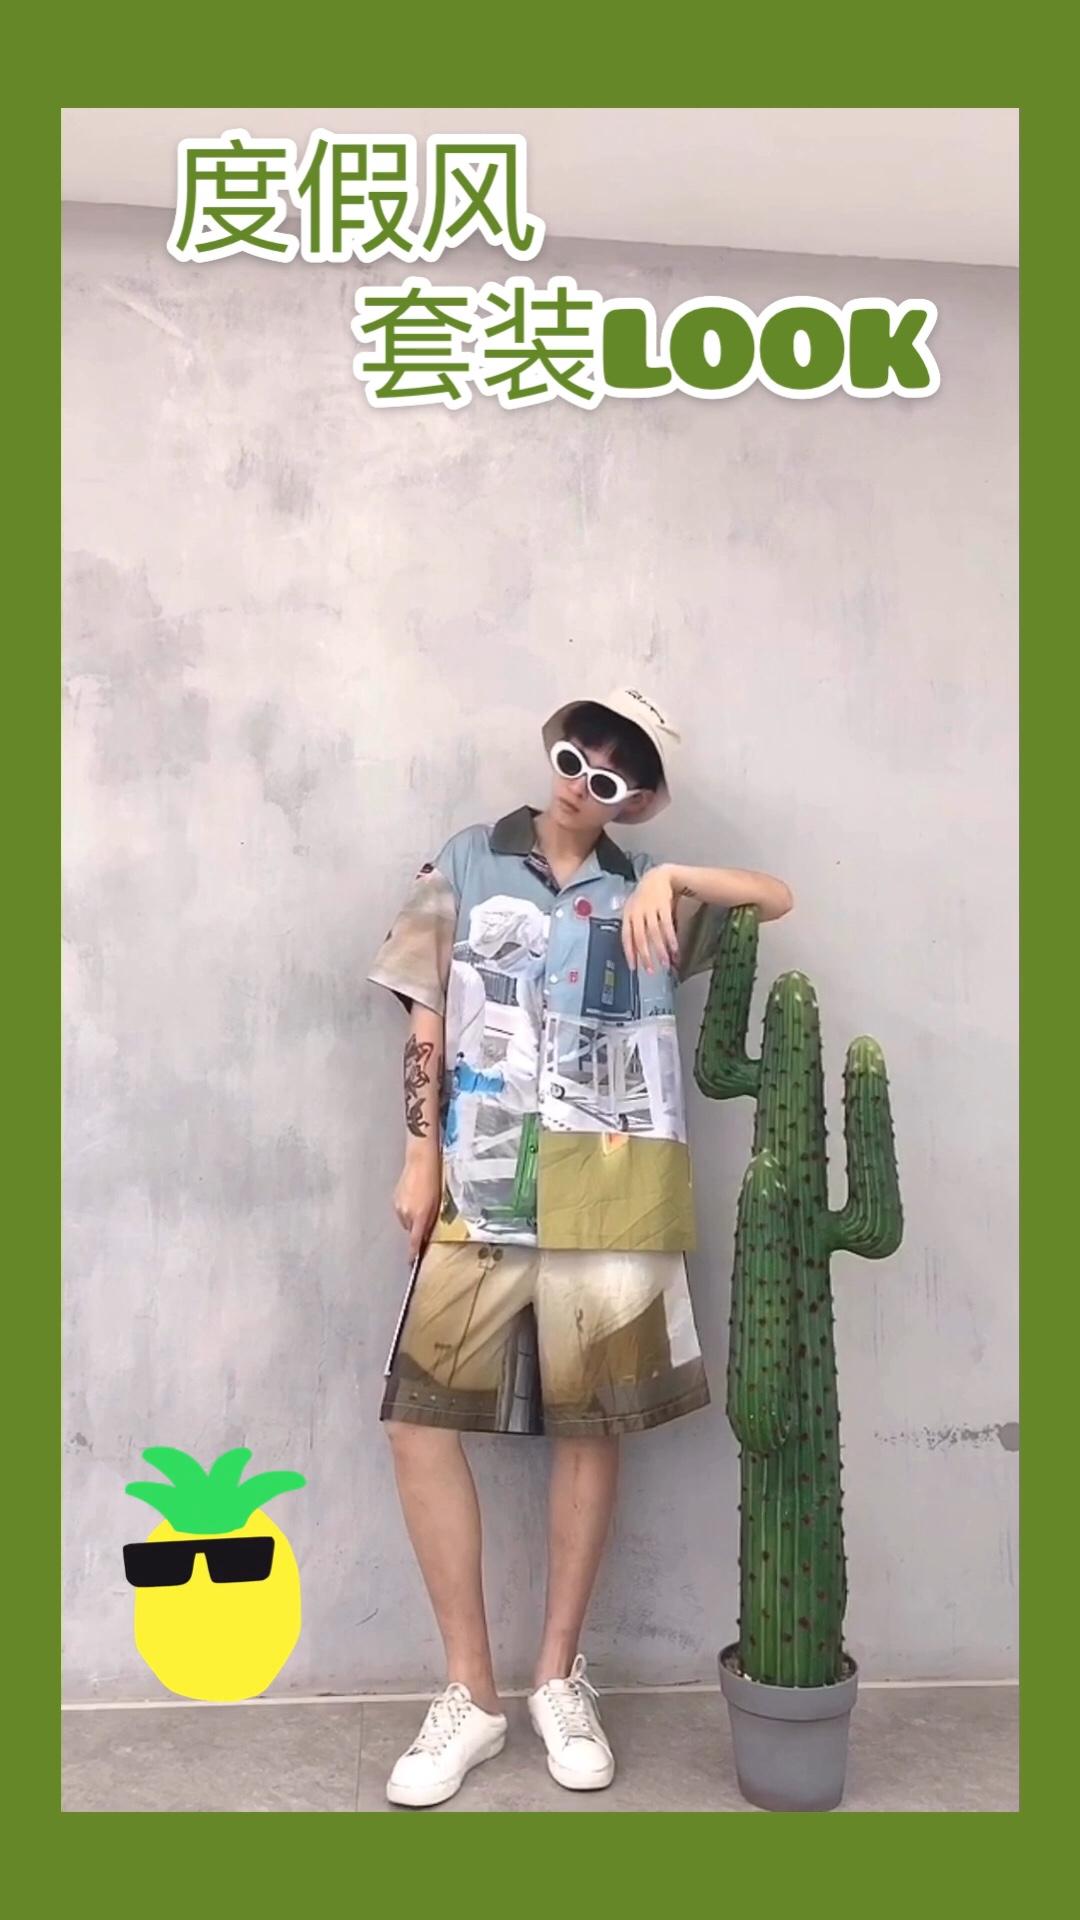 #MOGU Studio# 分享一套有点度假风的套装 套装印花非常好看 这个套装还可以一衣多穿 分开搭配一起搭配都可以~ 我这次是搭配了个度假风 所以戴上遮阳帽和太阳镜 可以出去晒阳光浴了啊